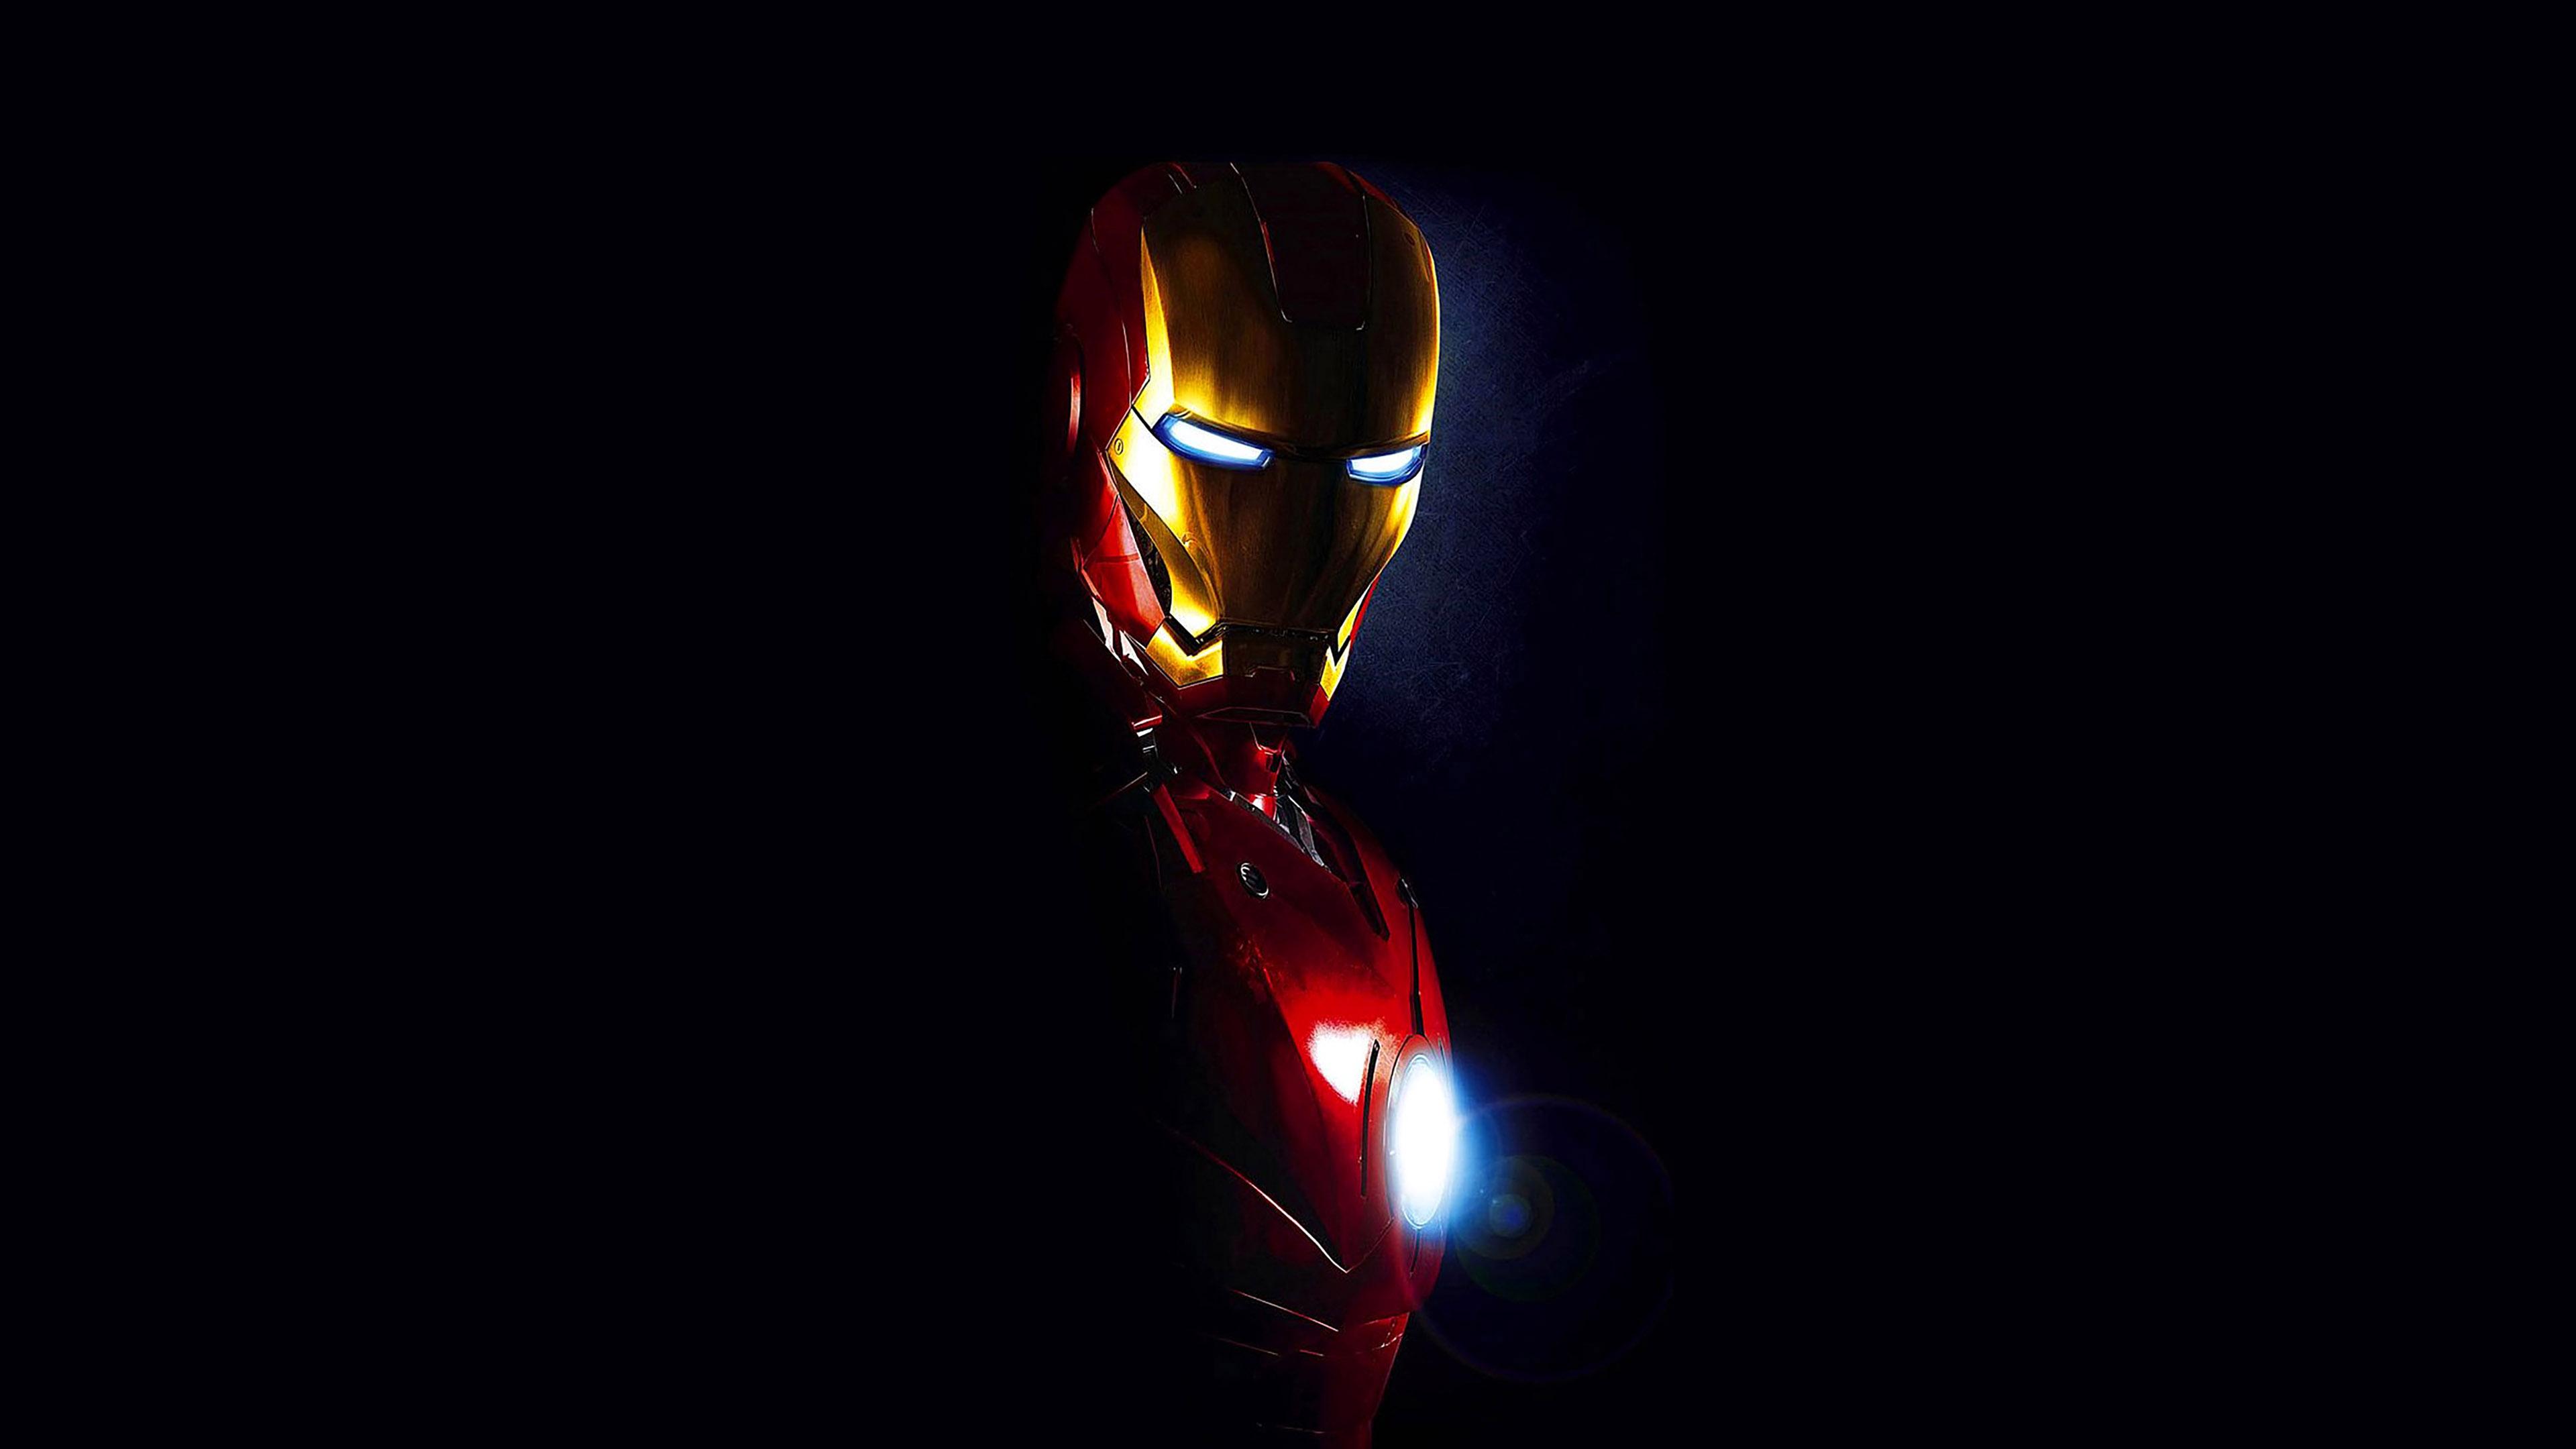 Aa25 Ironman In Dark Film Art